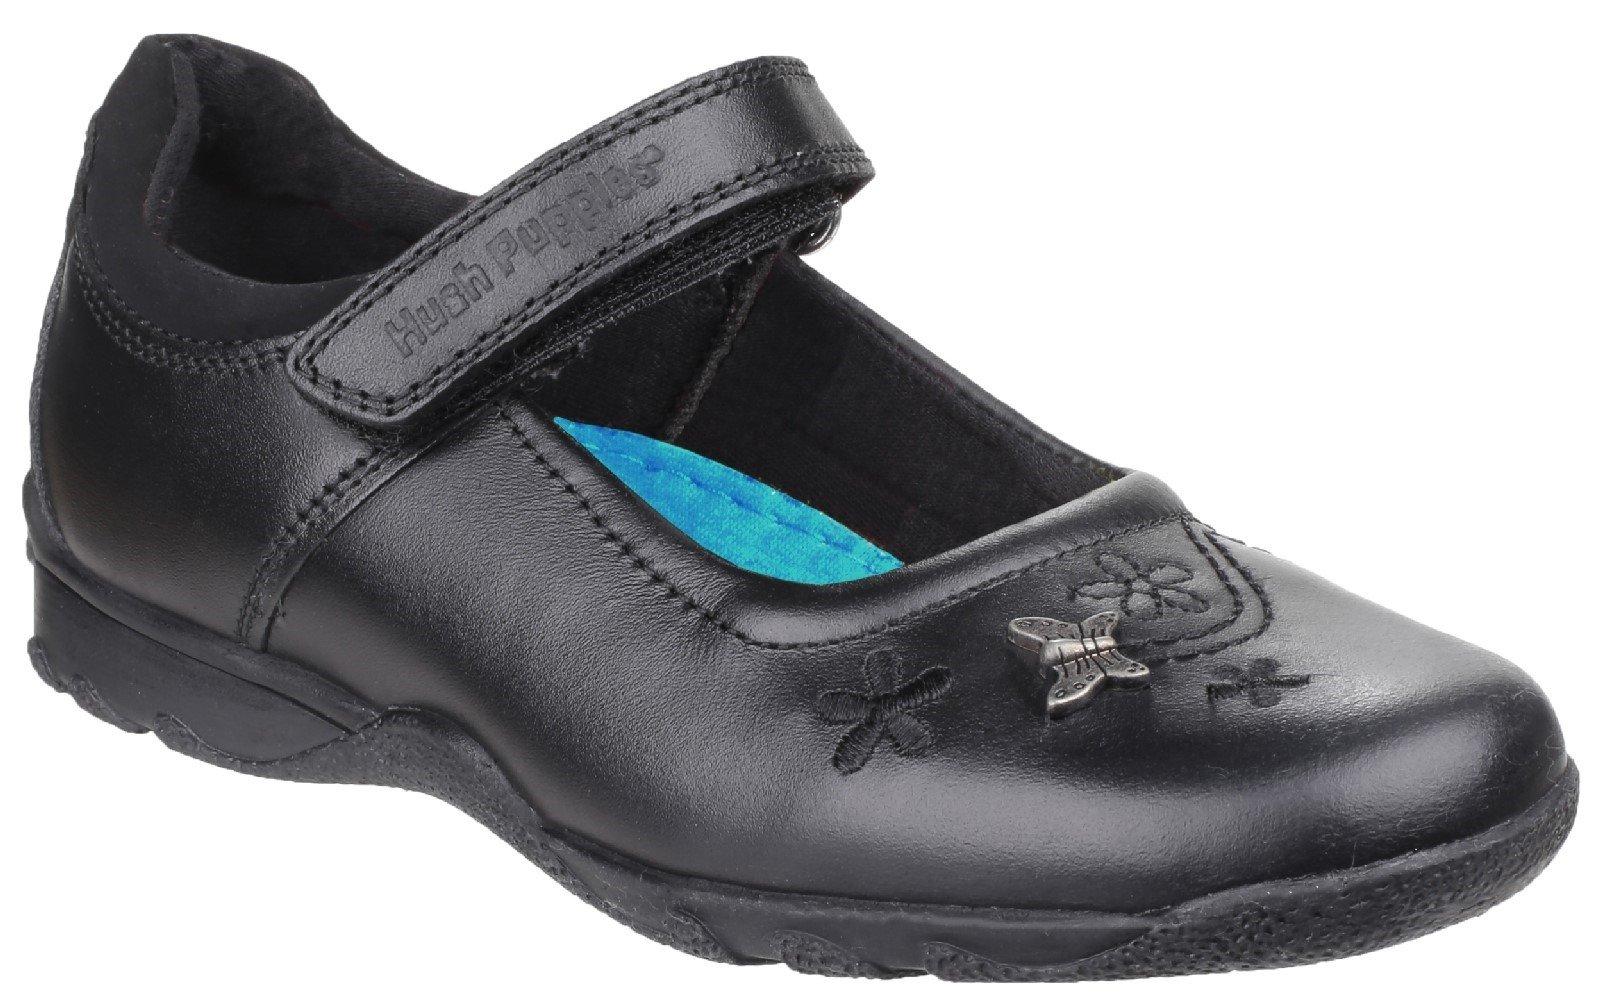 Hush Puppies Kid's Clare Back To School Shoe Black 25322 - Black 10 UK